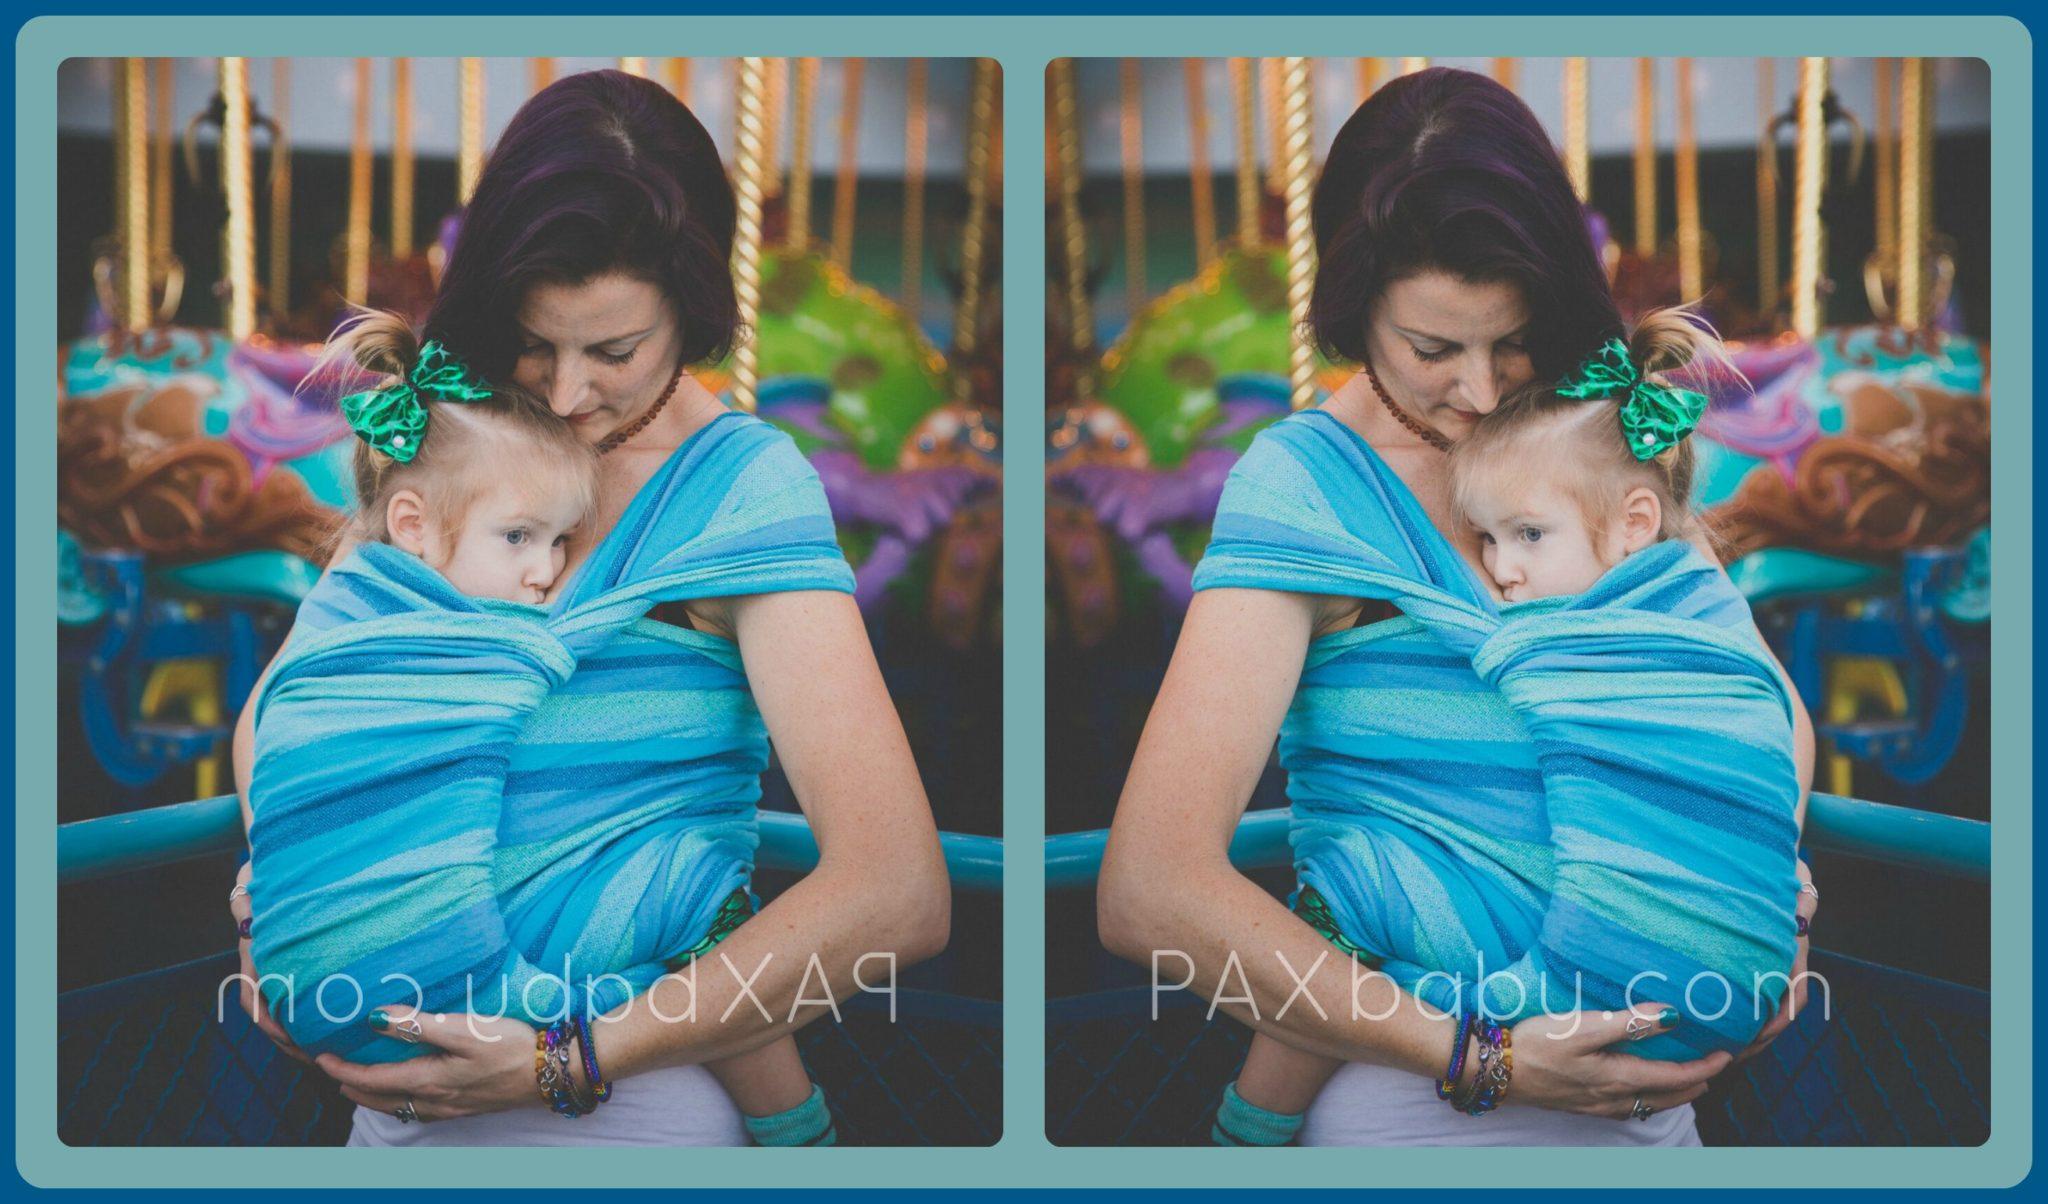 PAXbaby_triton_girasol_blue wrap_exclusive